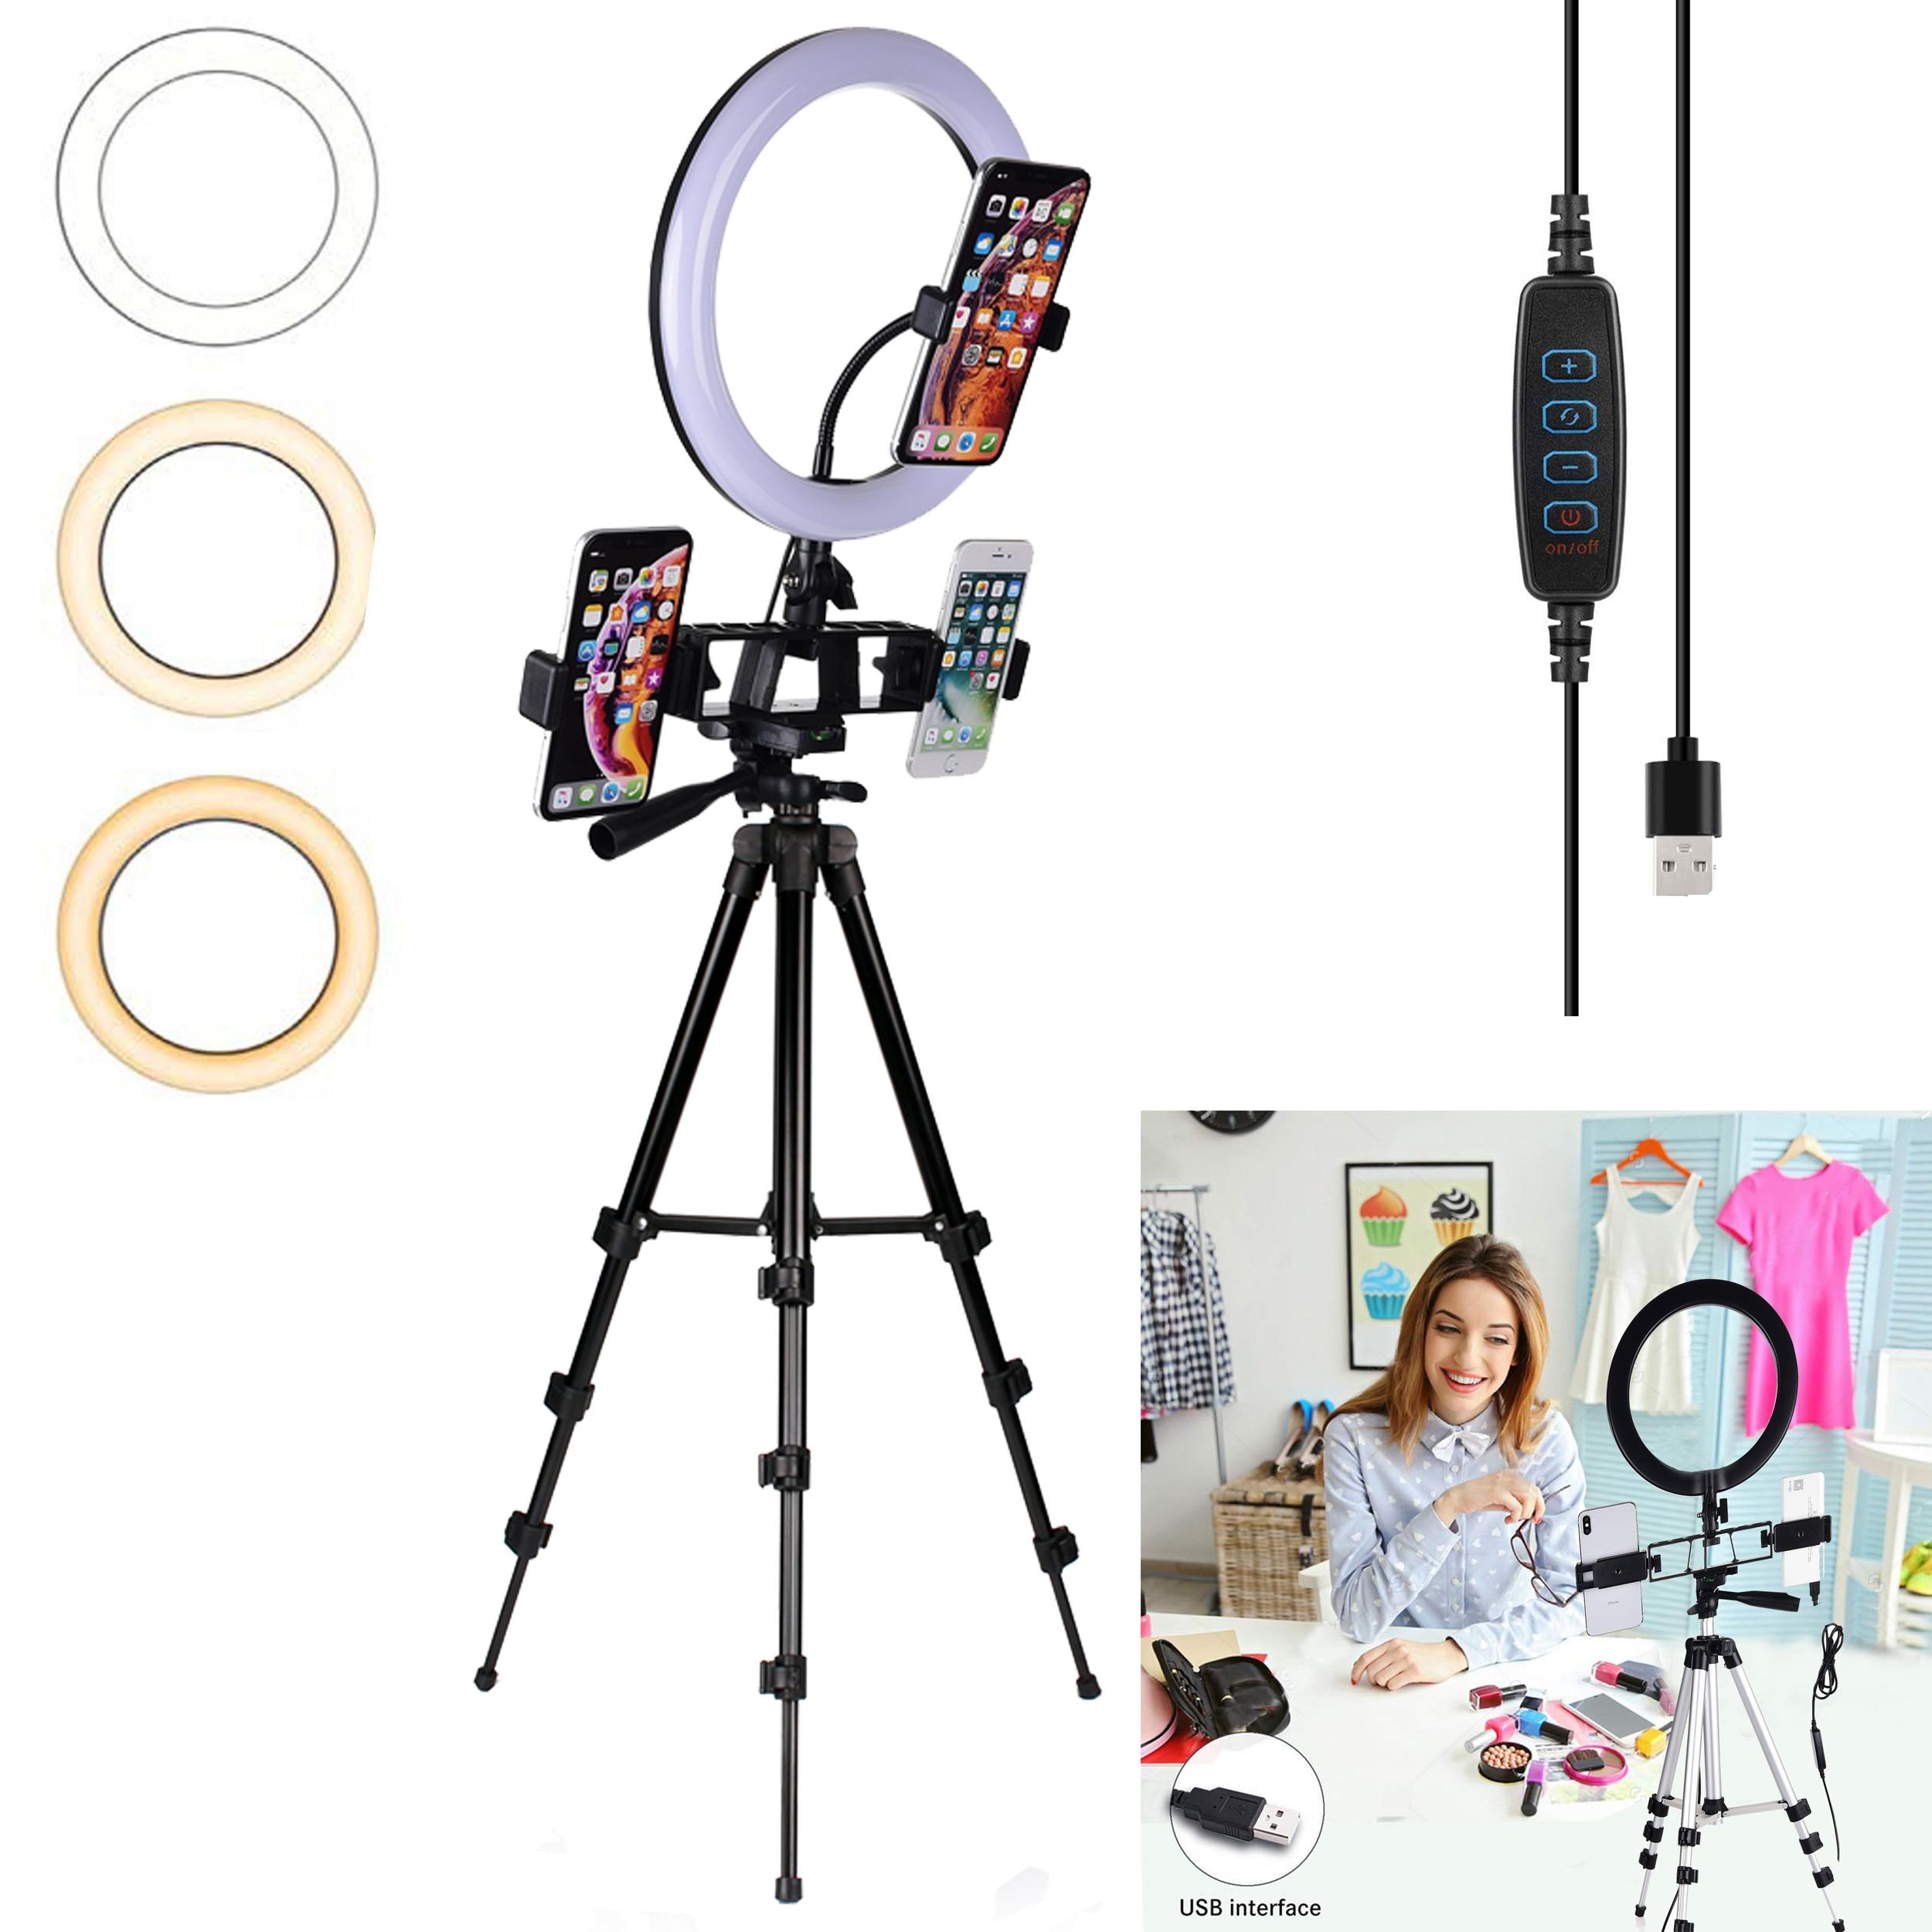 LED Ring Licht Dimmbare Ringlight Bi Farbe 3200K 5500K Fotografie Foto Studio für YouTube Video Schießen Lampe Schwarz stativ